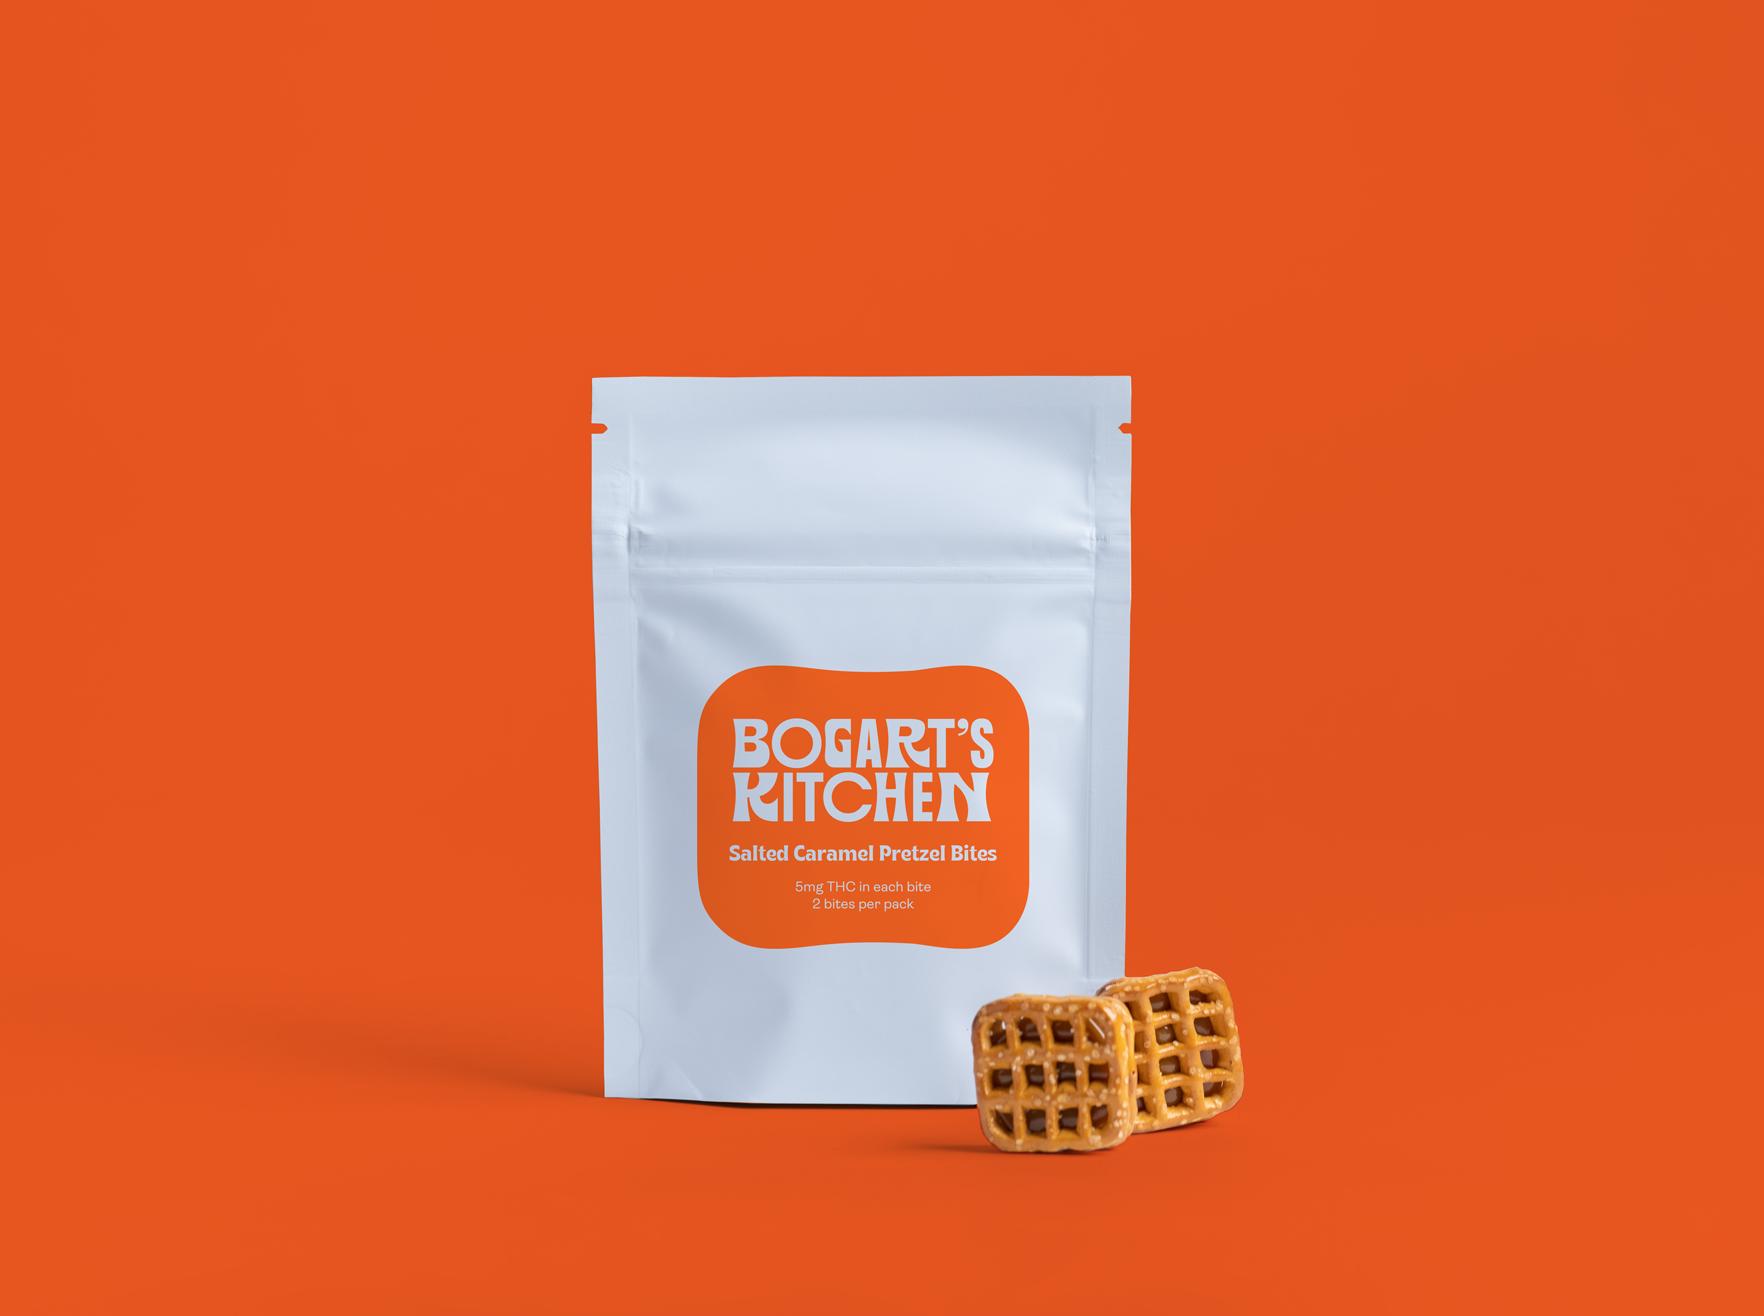 Aleafia Health Expands Bogart's Kitchen Edibles Portfolio with Launch of Salted Caramel Pretzel Bites